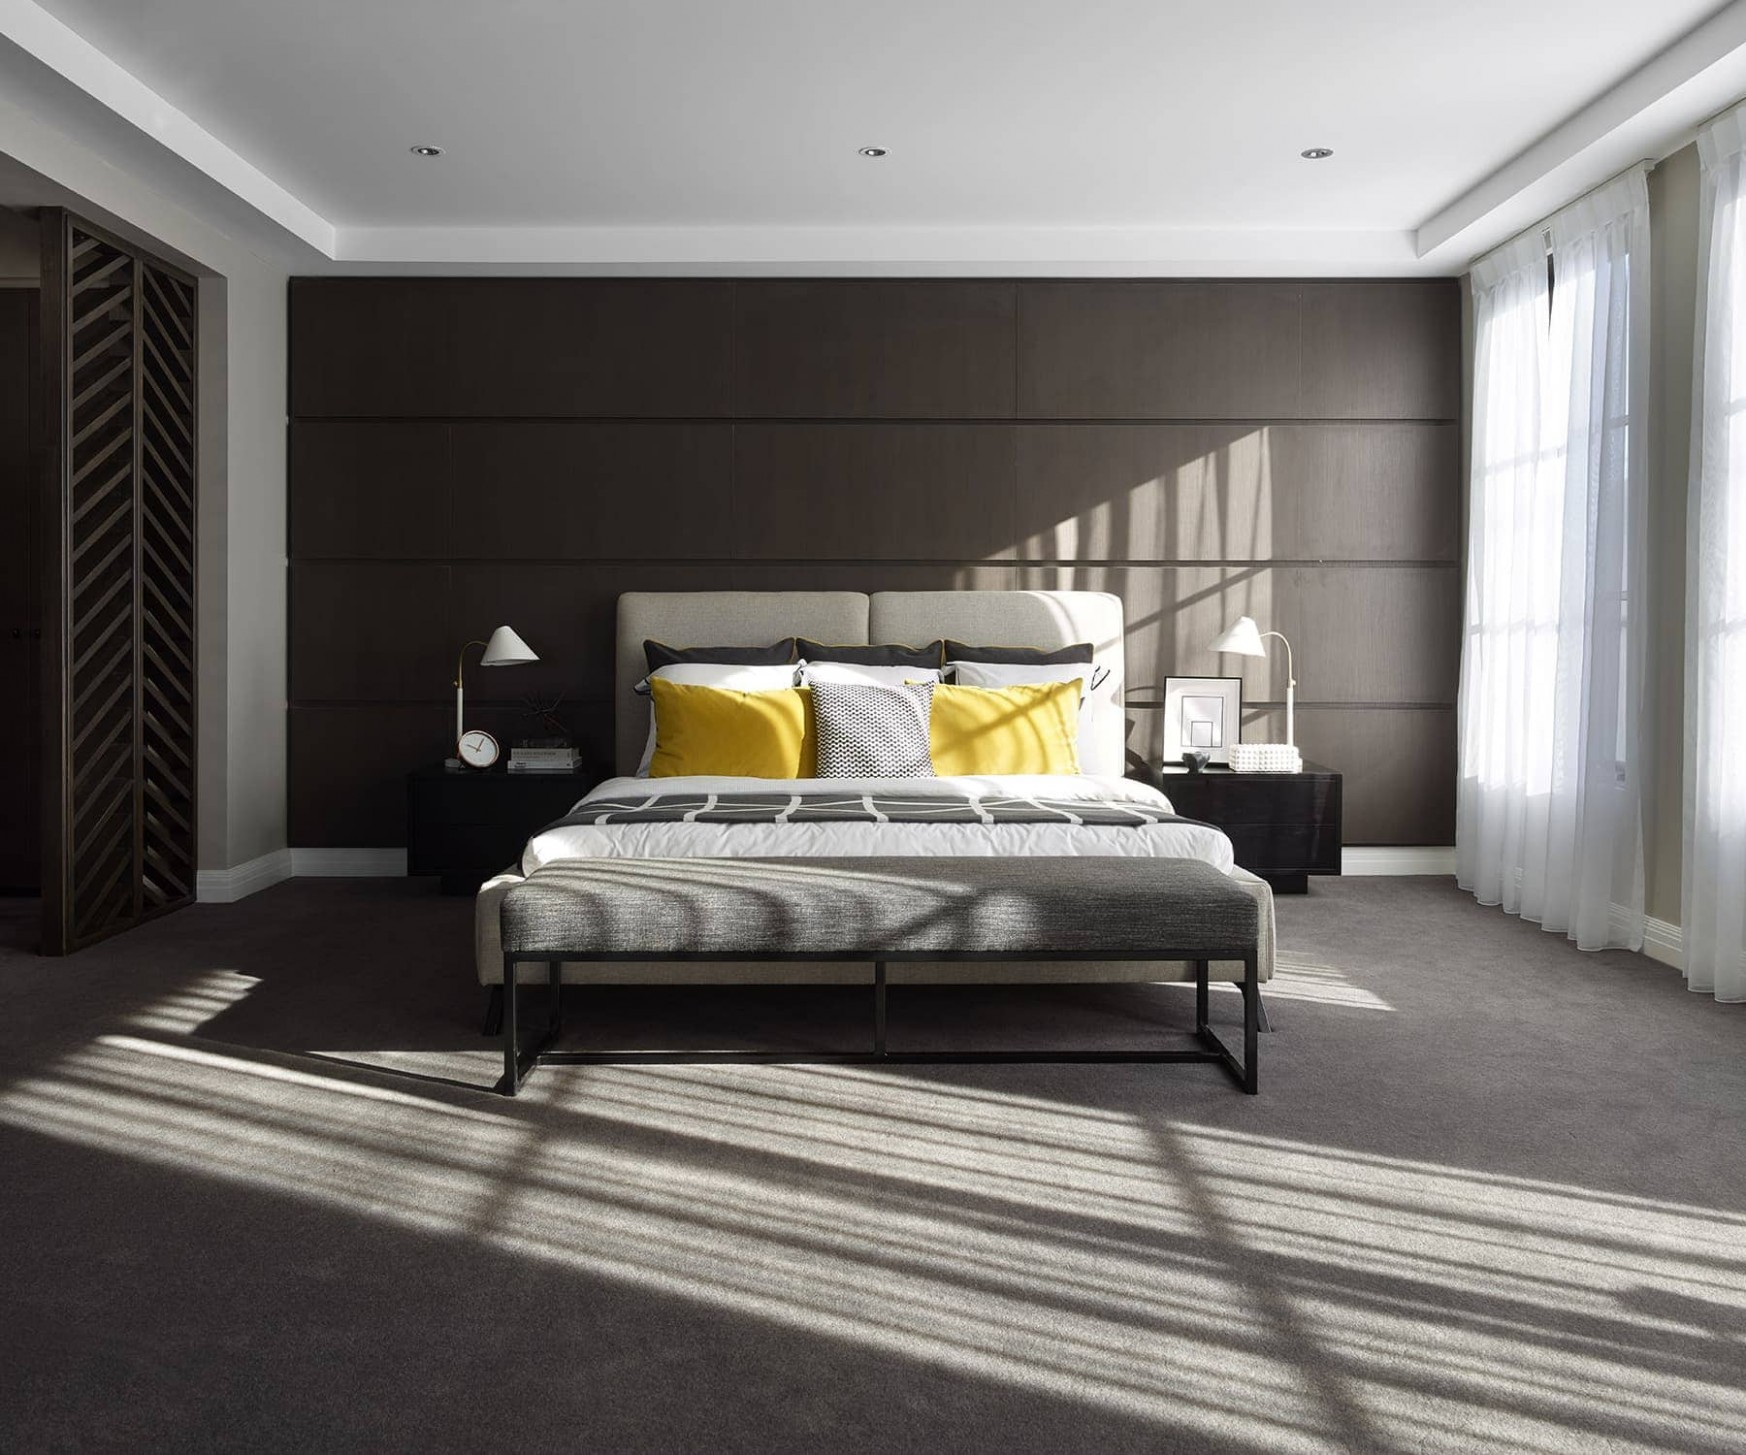 11 Dark Bedroom Wall Ideas to Embrace - TLC Interiors - Bedroom Ideas Dark Grey